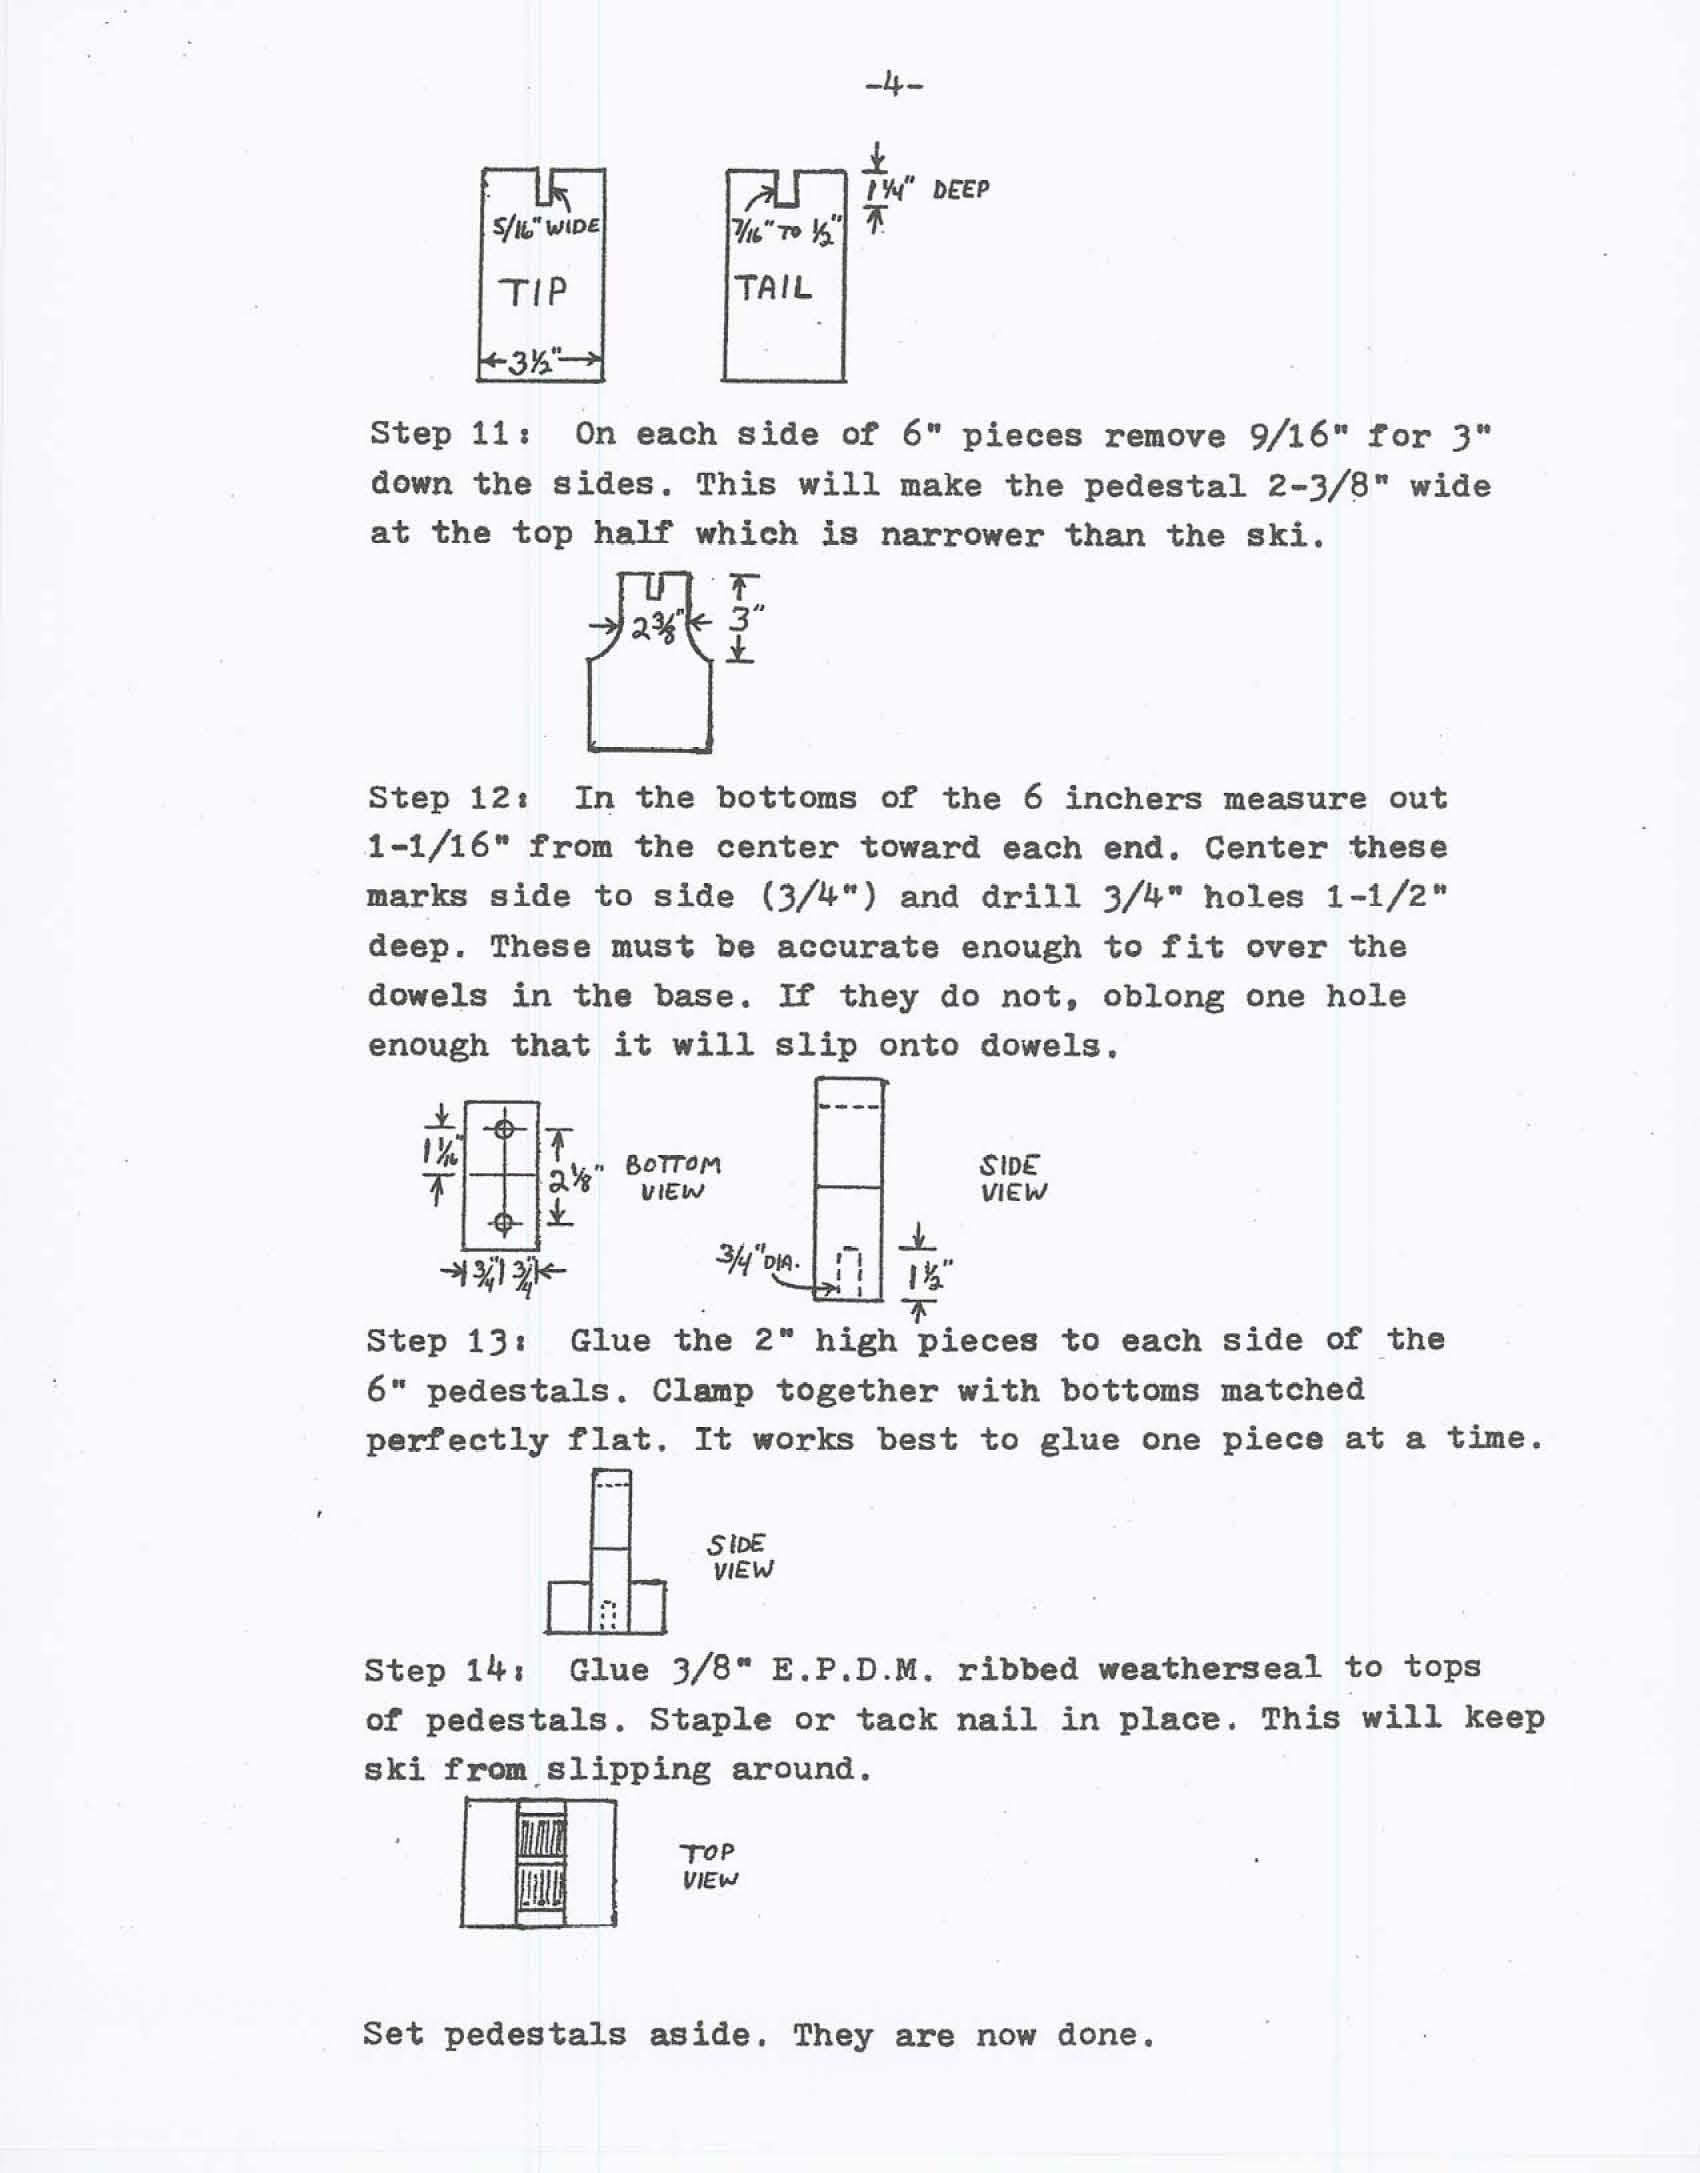 toolbenchplans-img-4.jpg